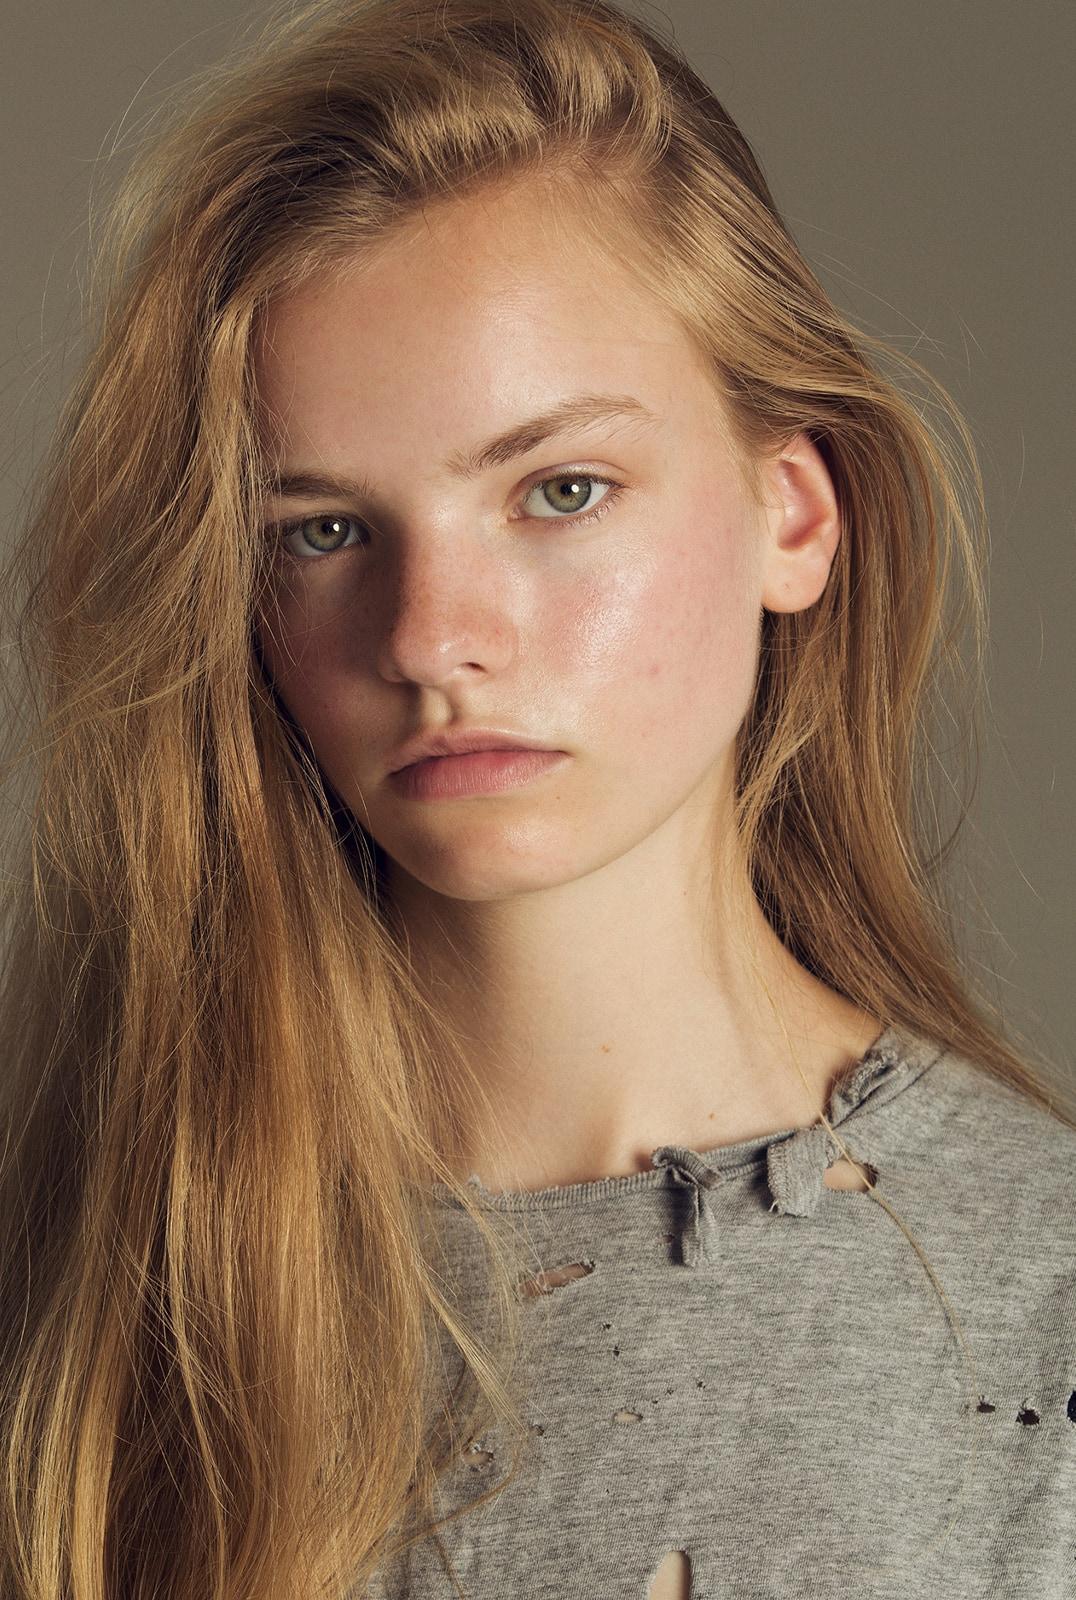 Nade - a model from France | Model Management